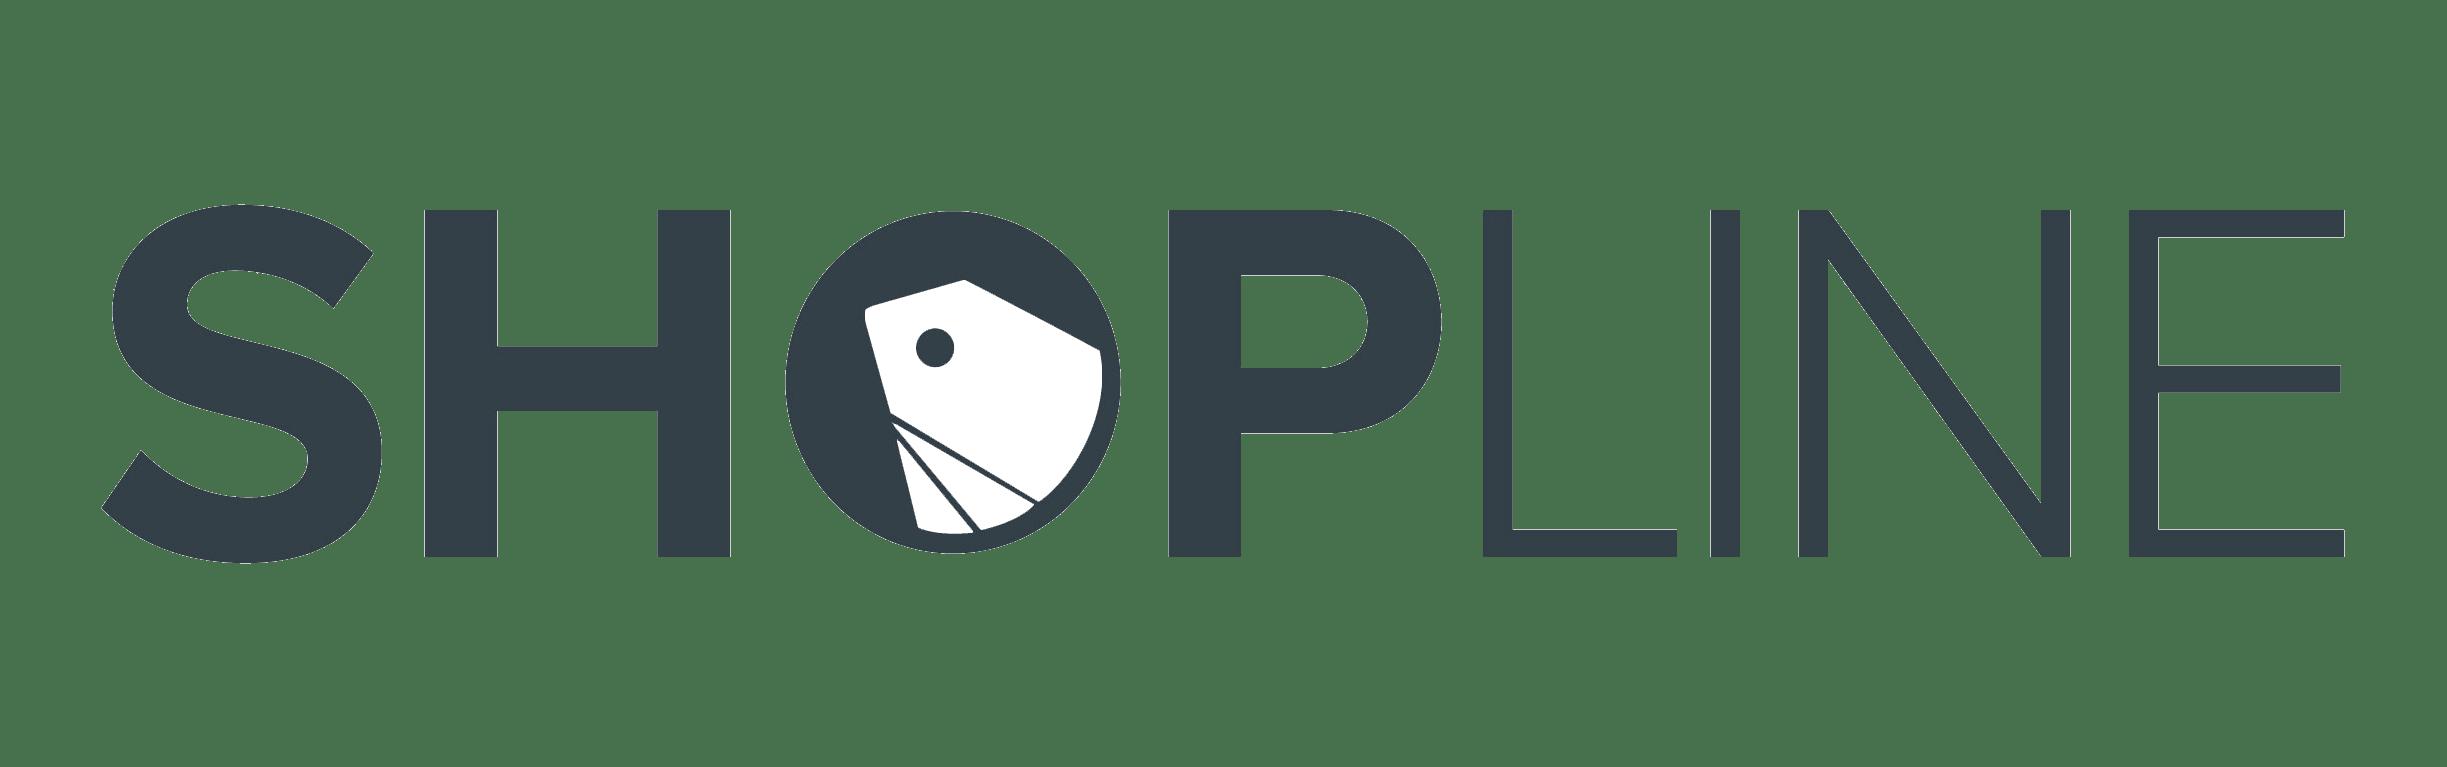 Shopline company logo